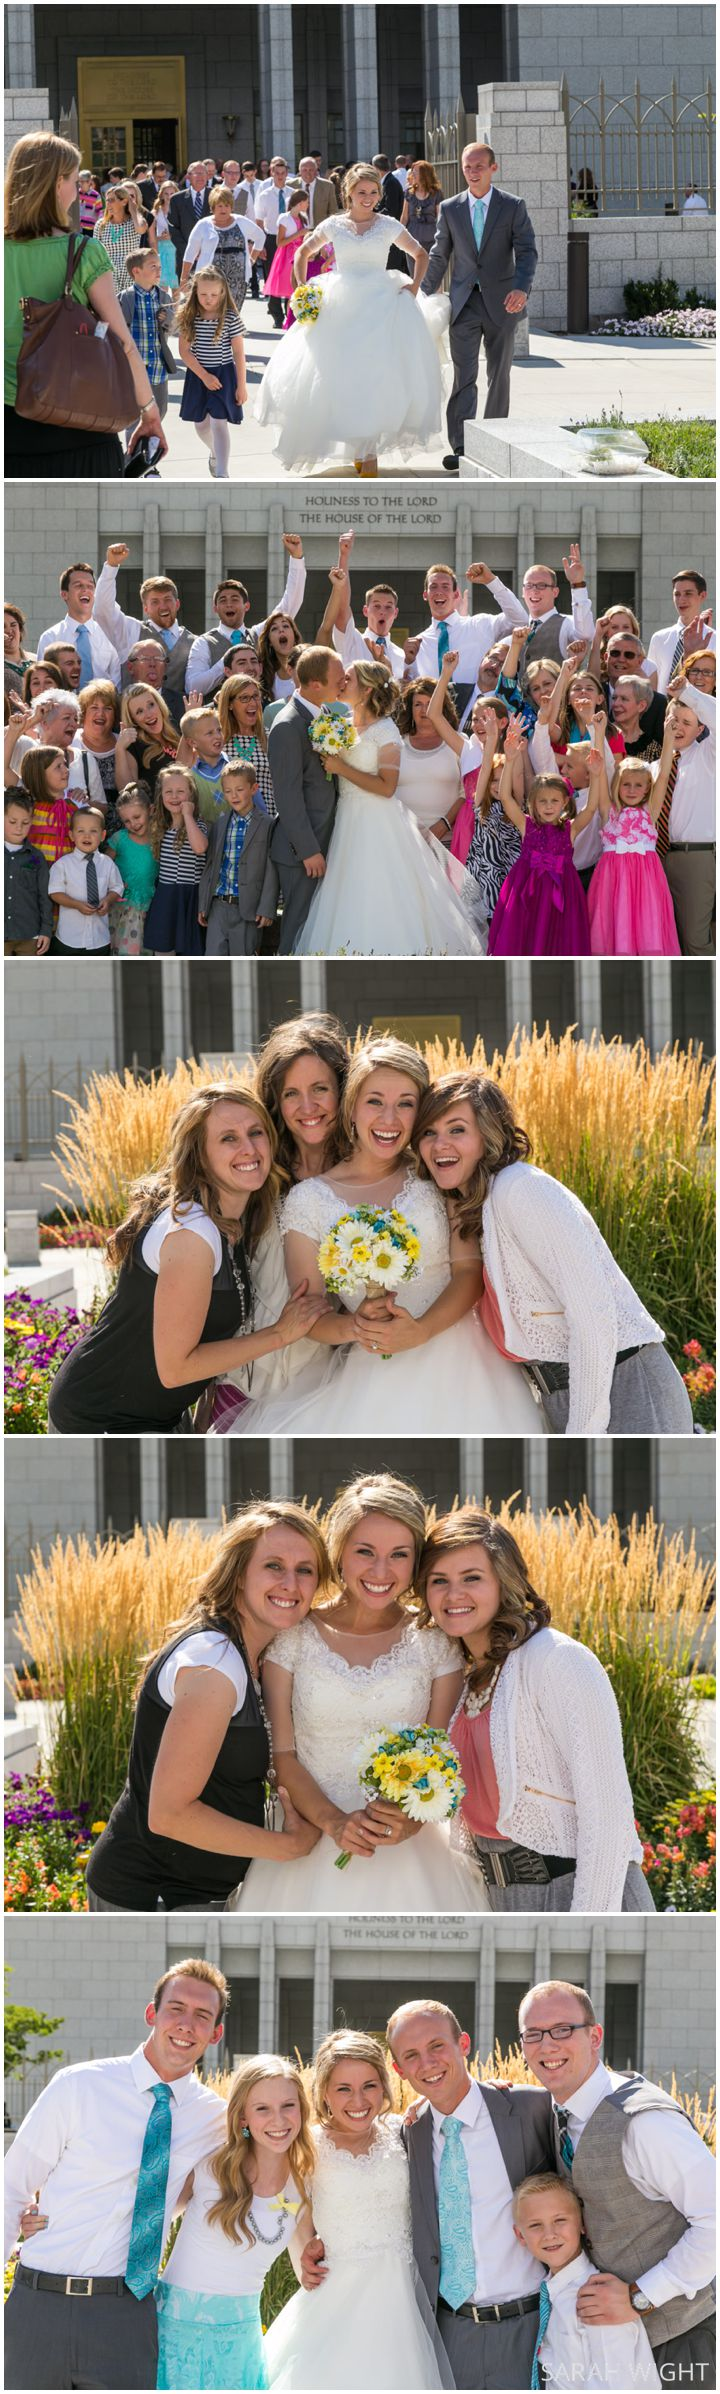 Utah Wedding Bungalow Draper Photographer-7.jpg